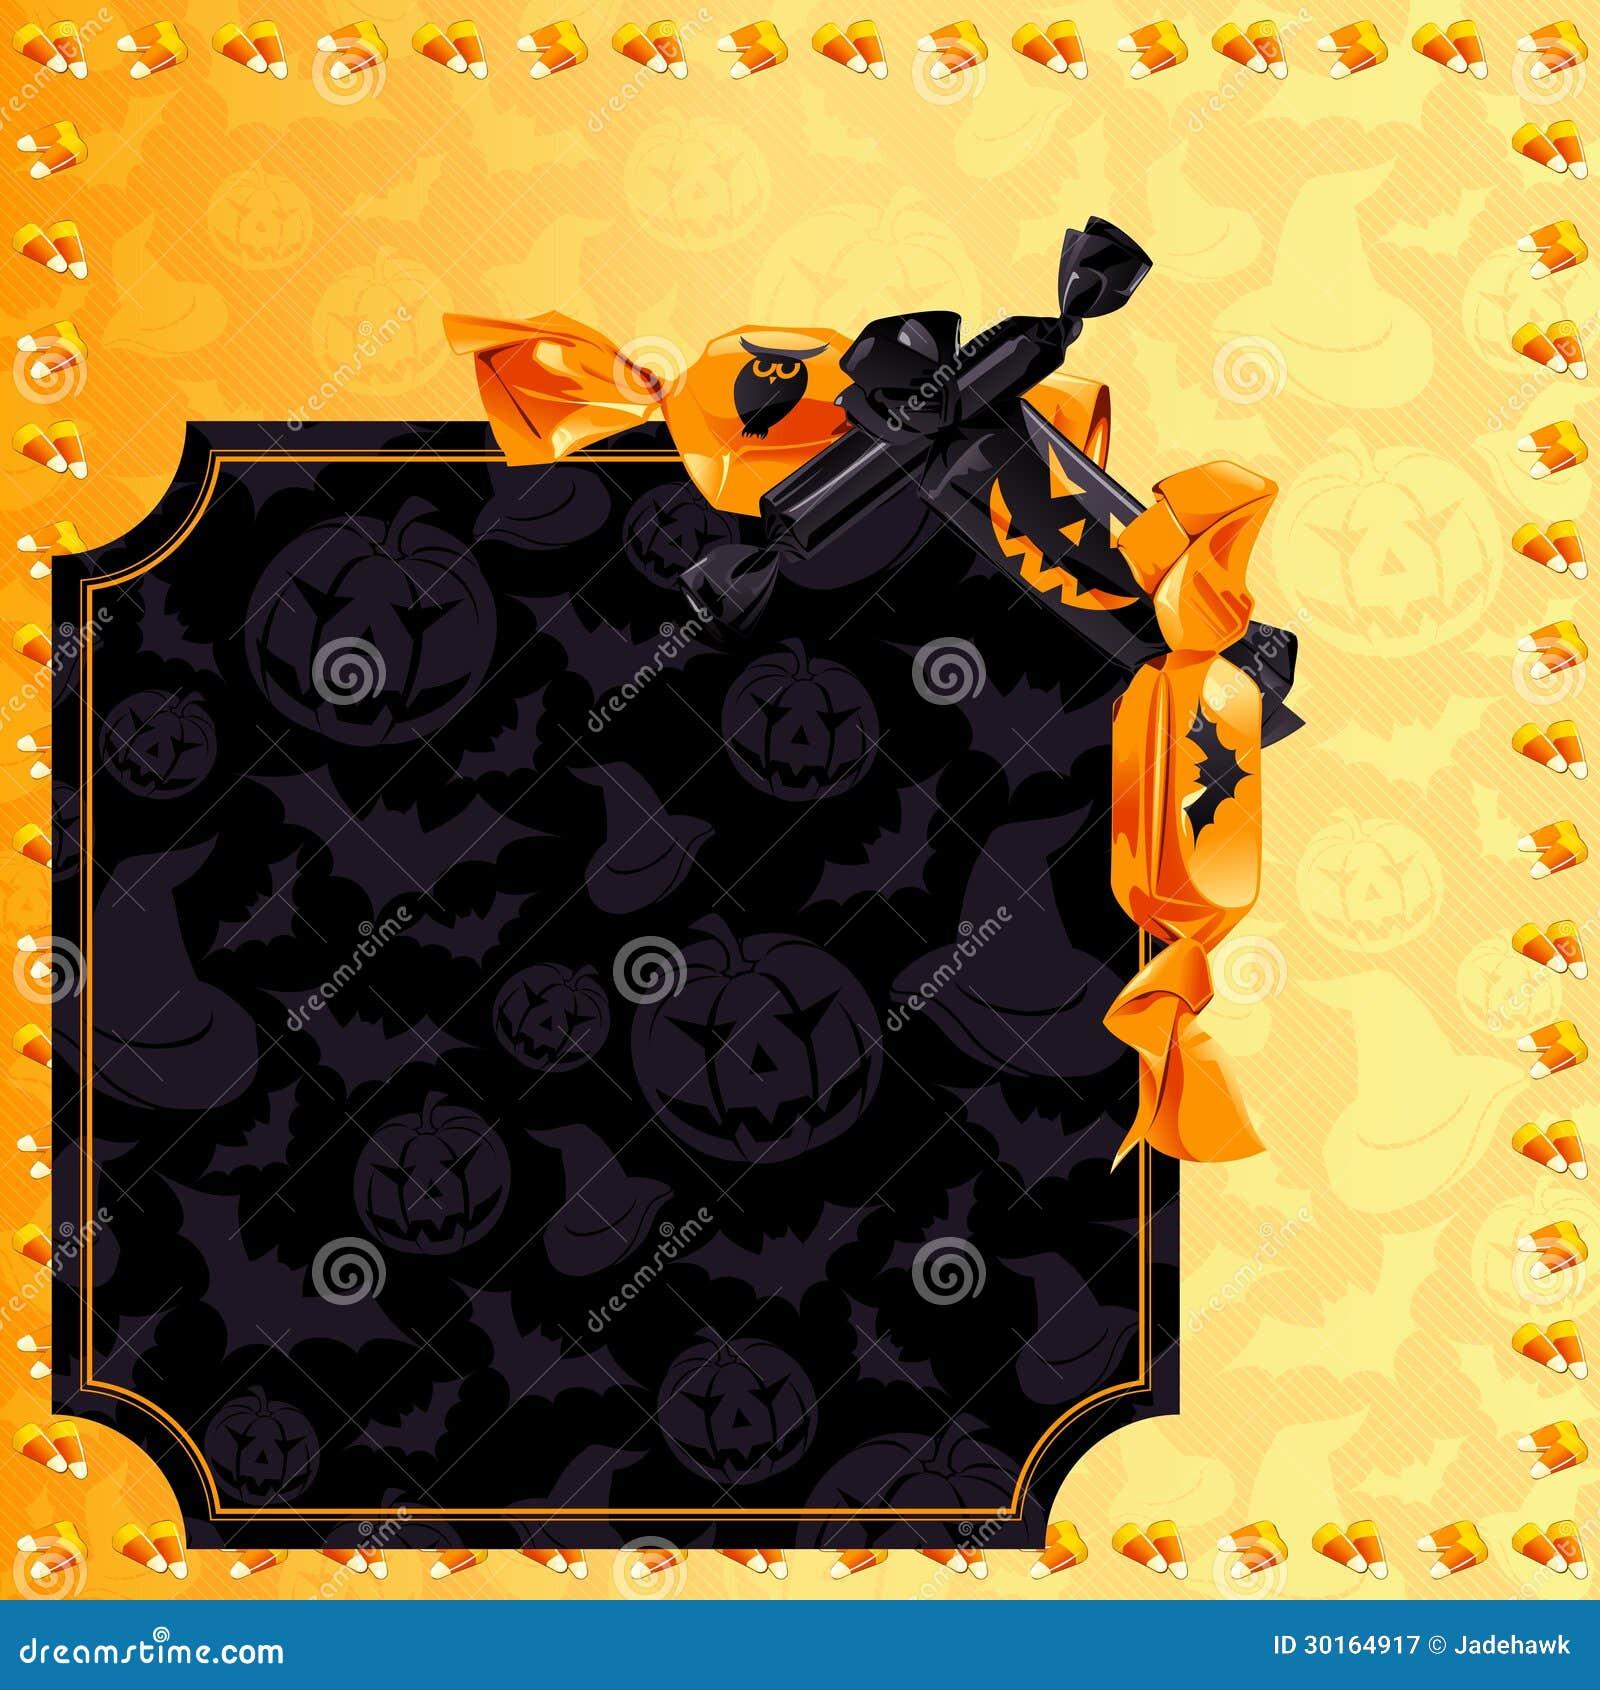 elegant halloween candy background stock vector - illustration of